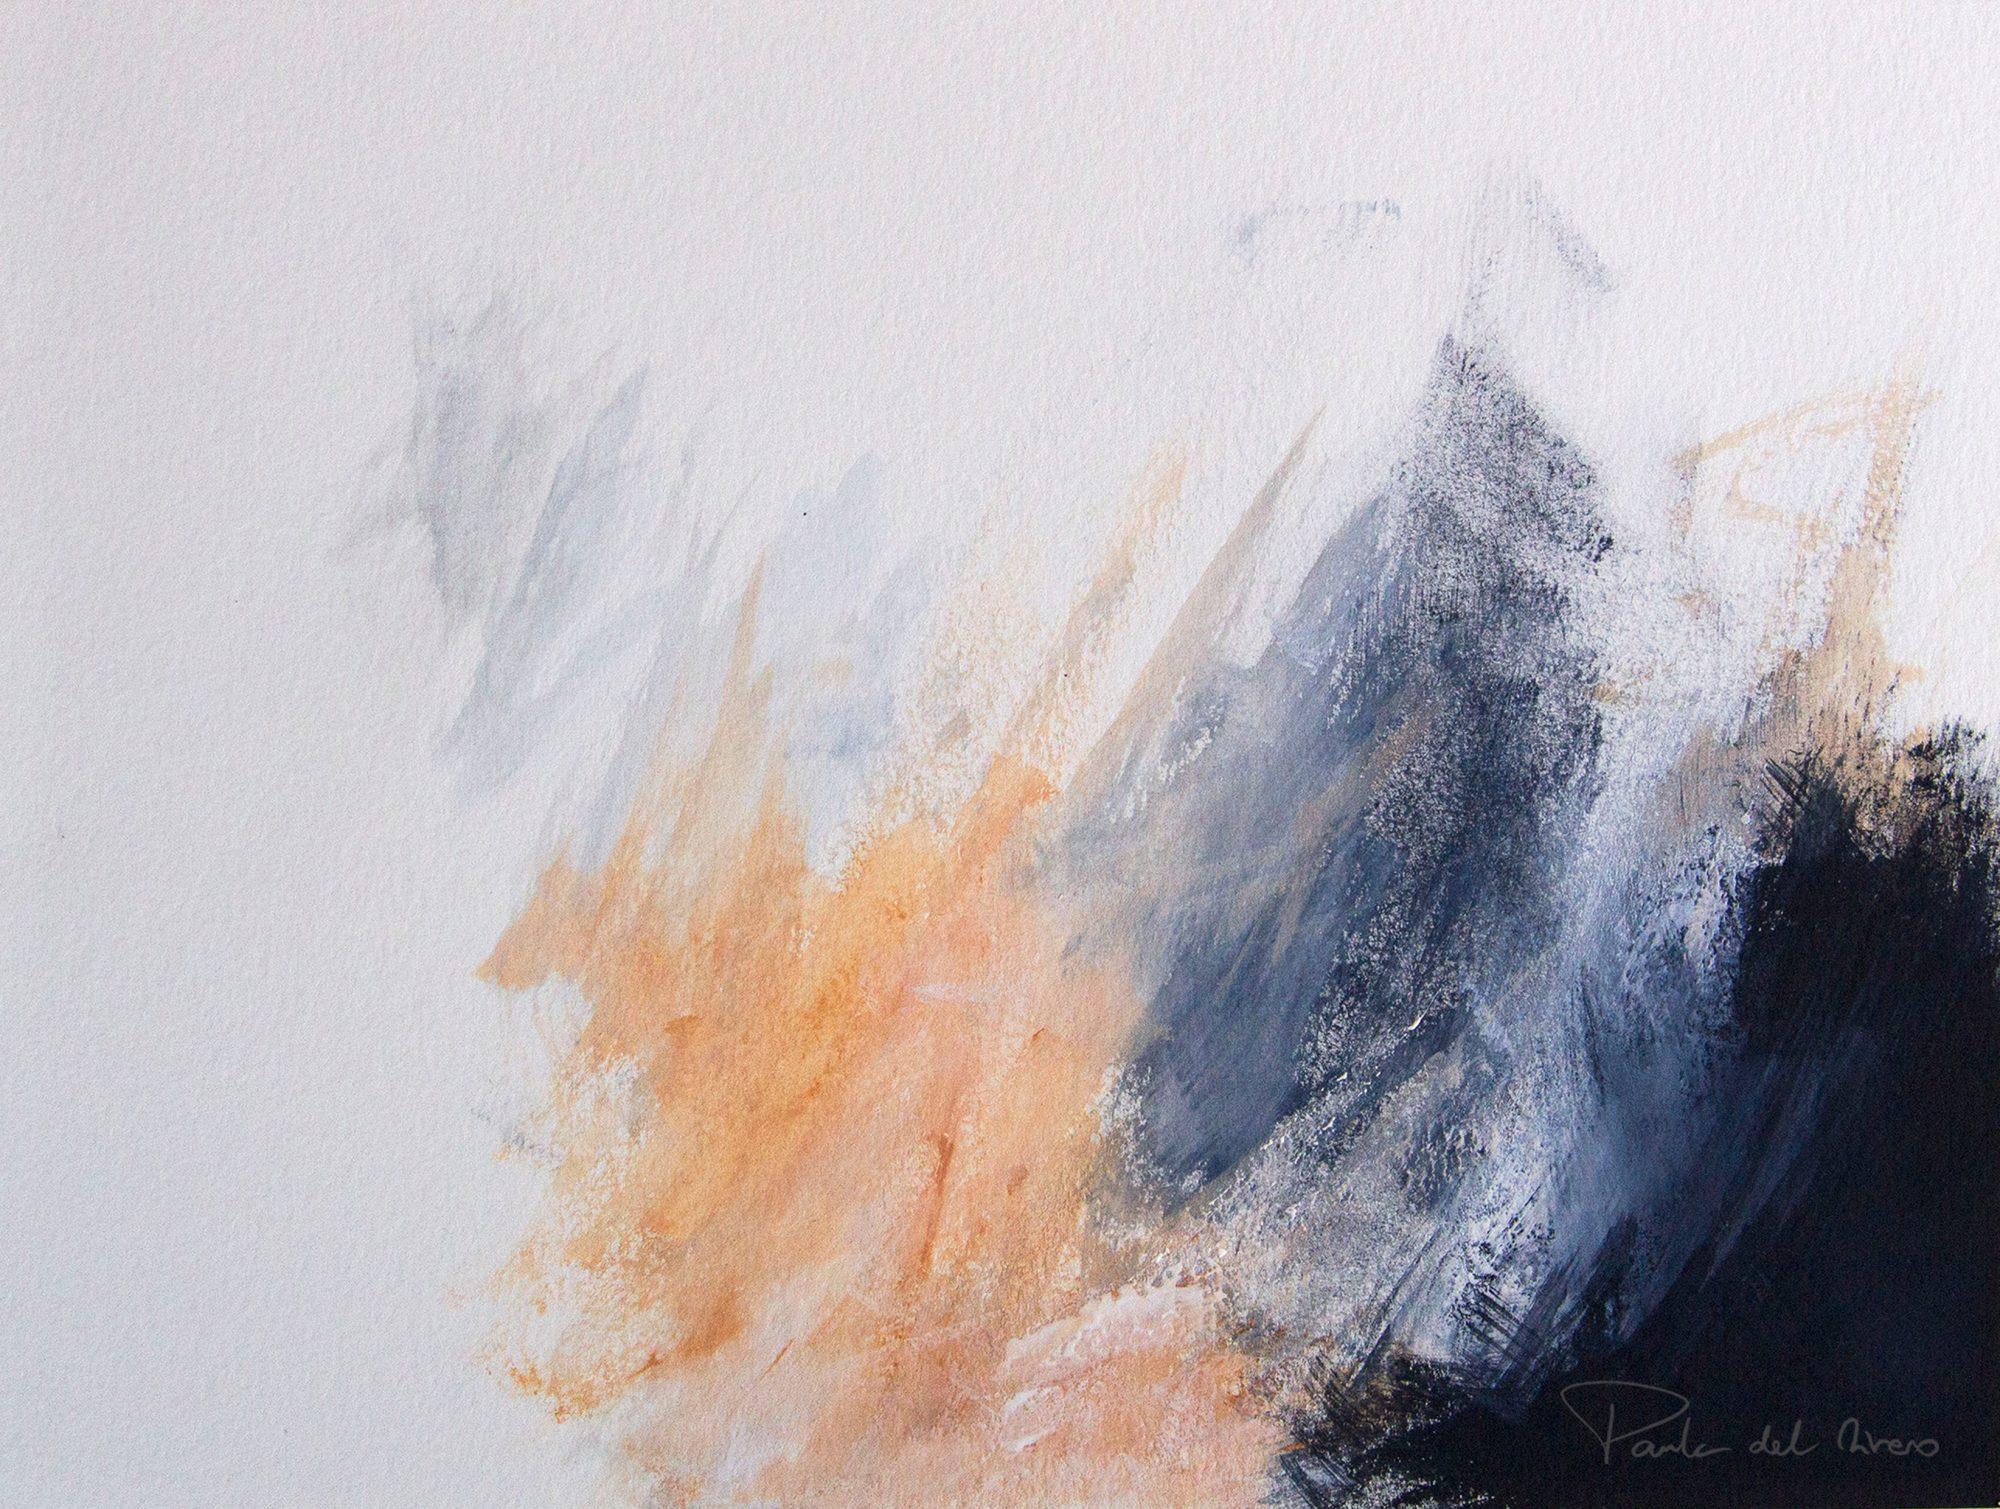 Paula del Rivero - Contemporary abstract art - 'Heaven's Pond V'